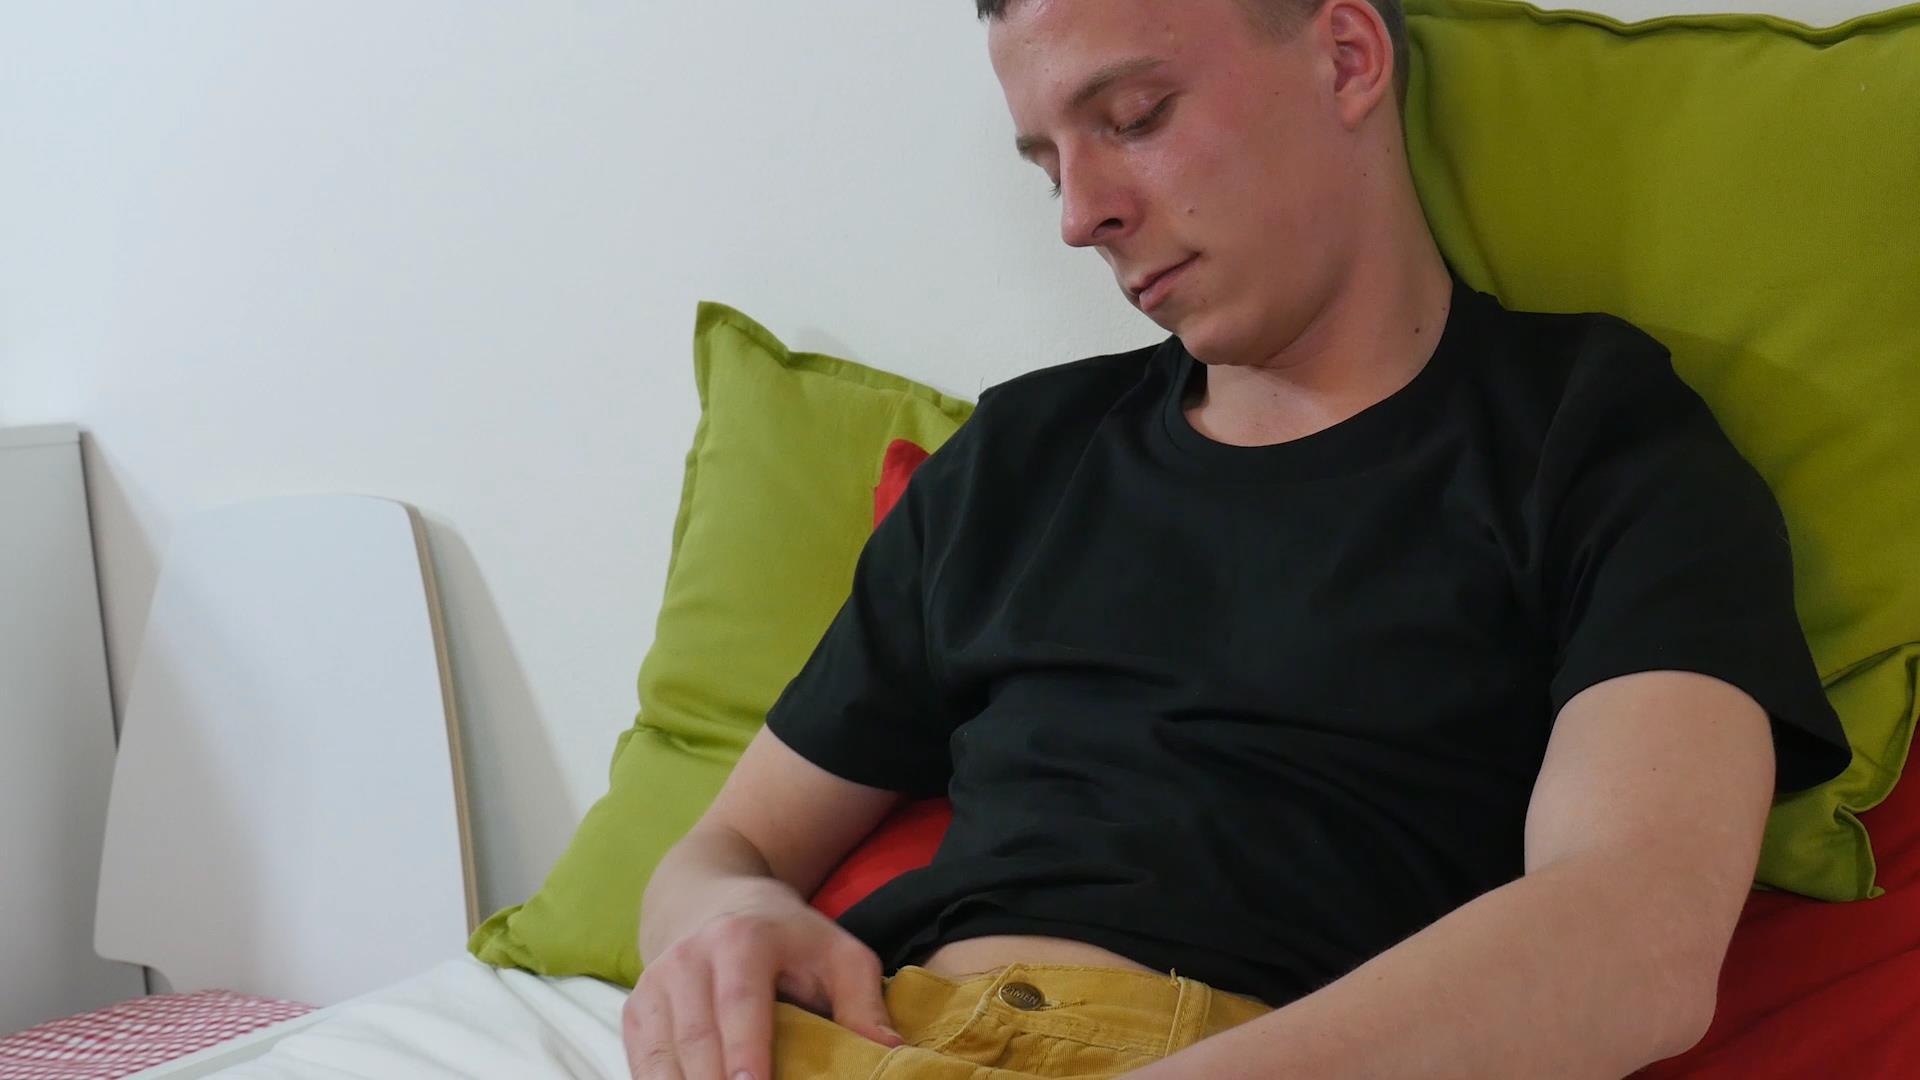 Twink-Boys-Party-Andrew-Kitt-Twink-With-Big-Uncut-Cock-Masturbation-Amateur-Gay-Porn-01.jpg